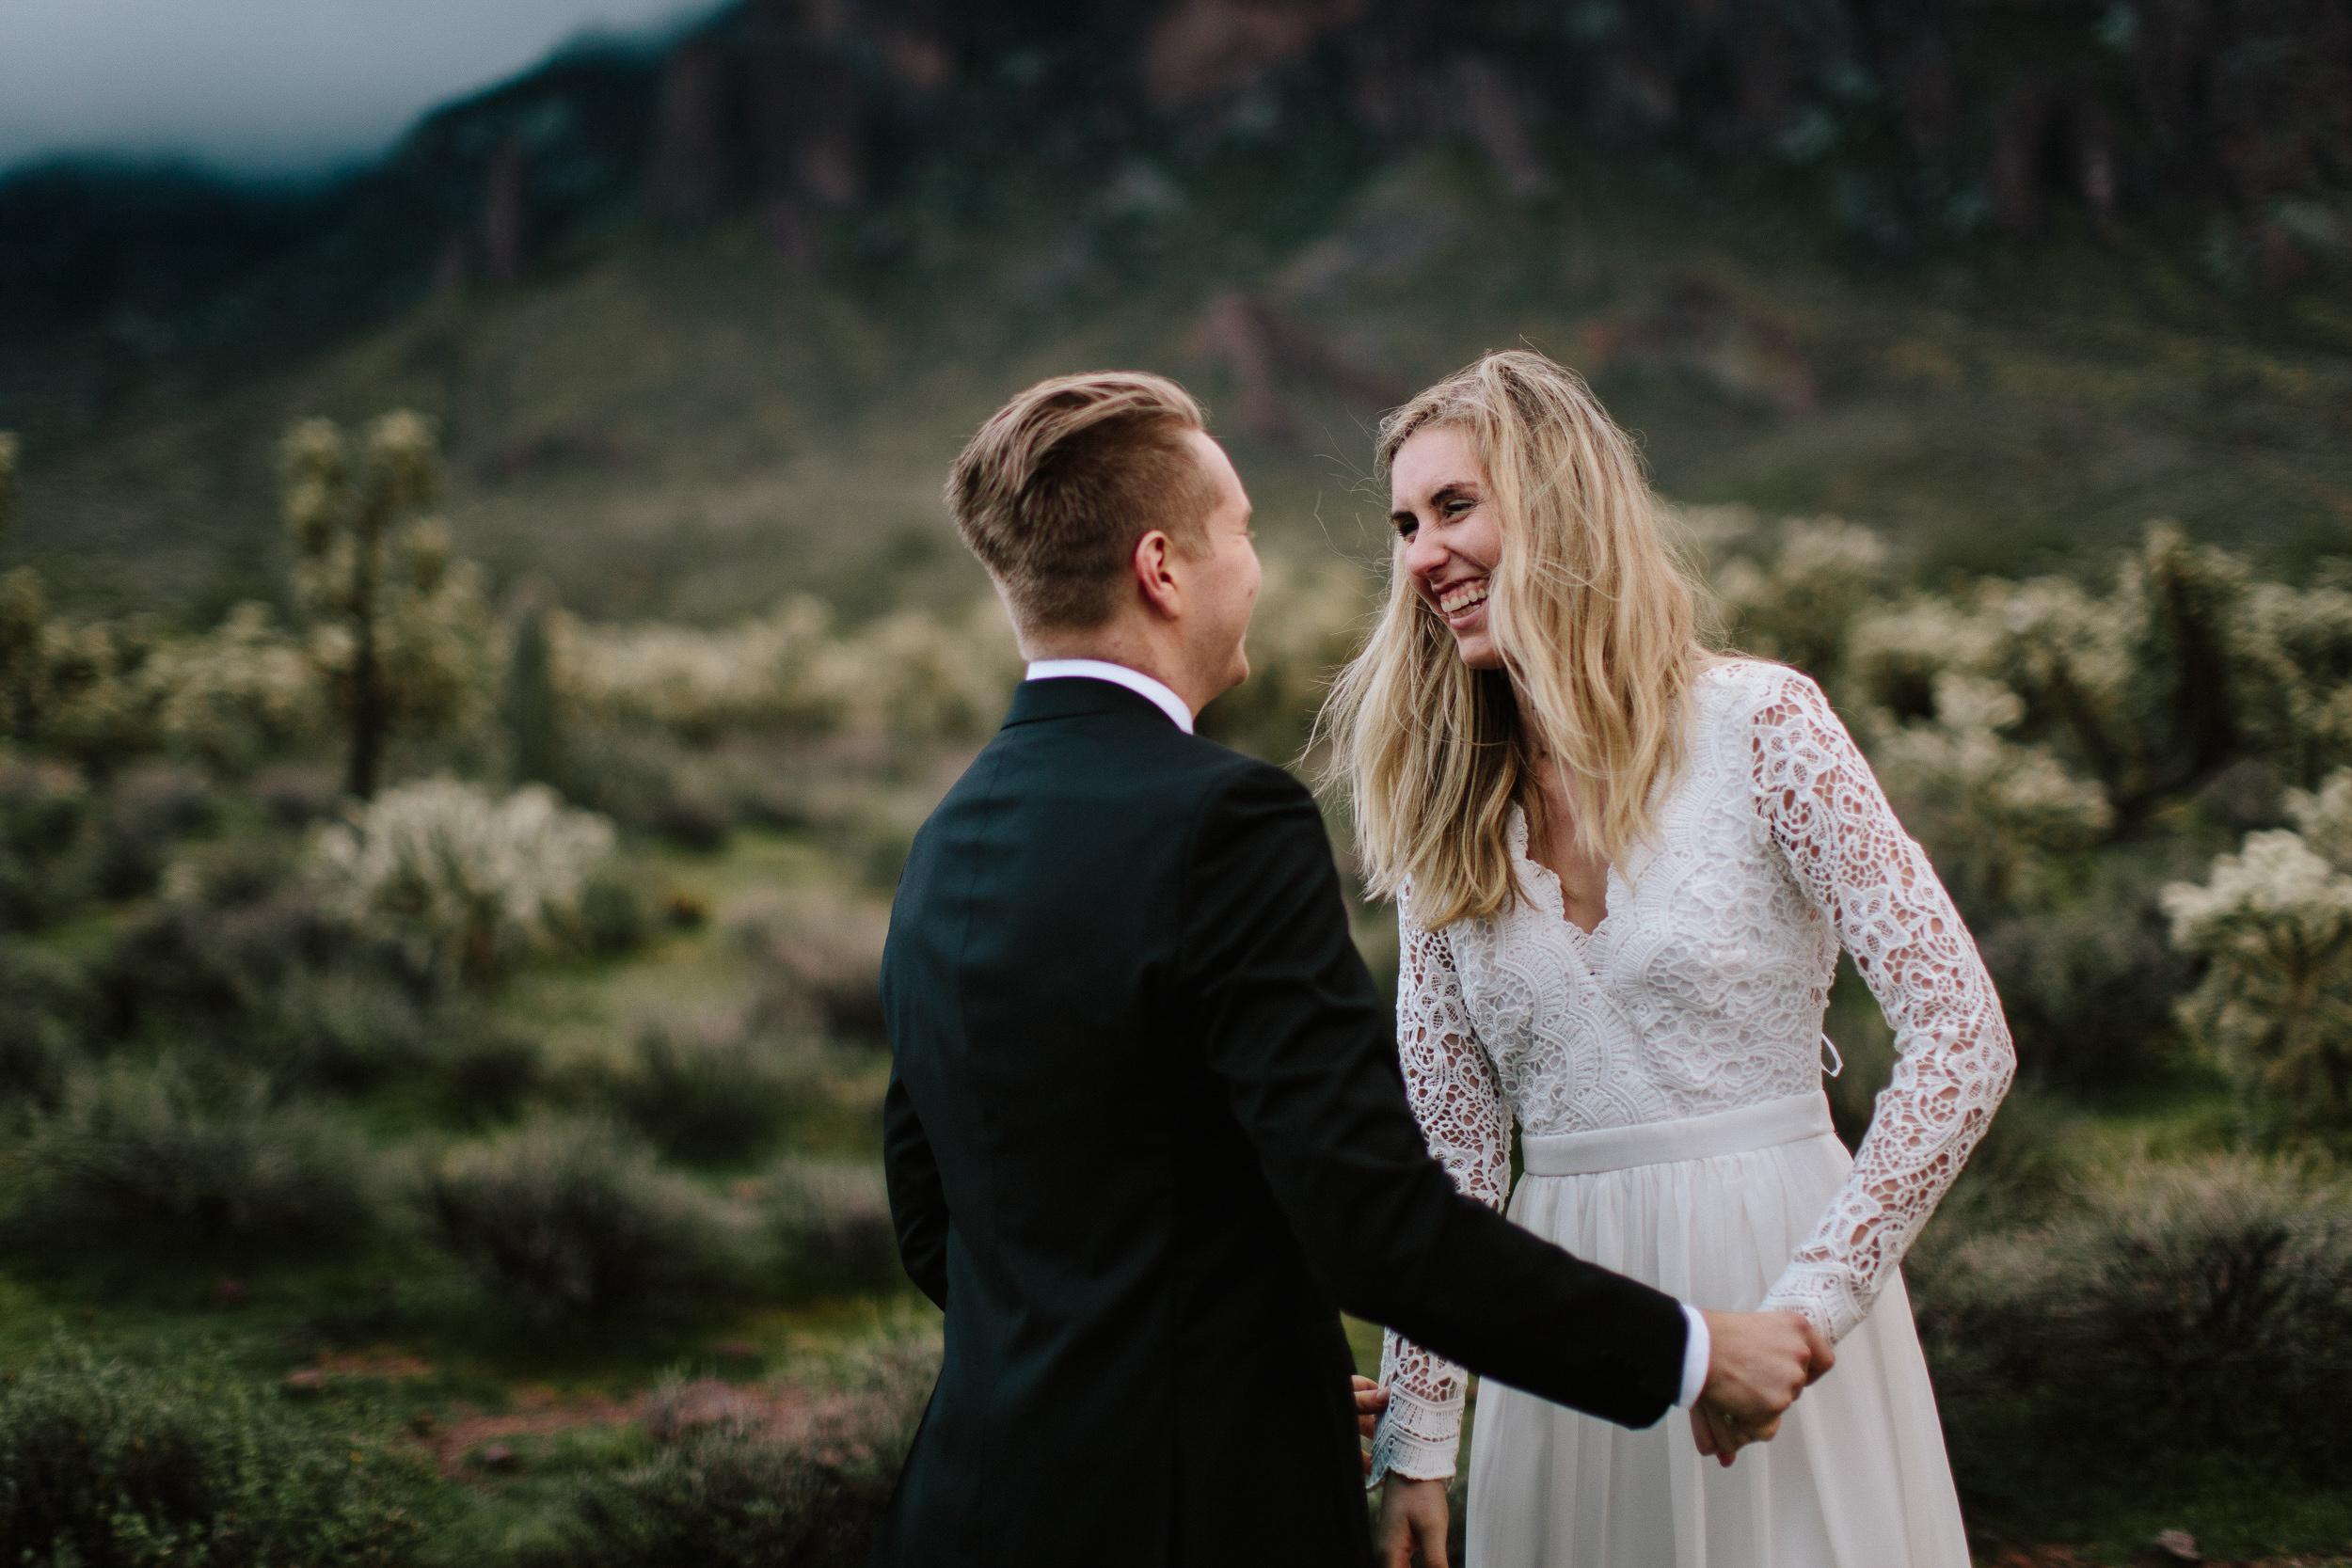 phoenix-mesa-elopement-wedding-photographer-lost-dutchman-state-park-superstitious-mountains-44.jpg